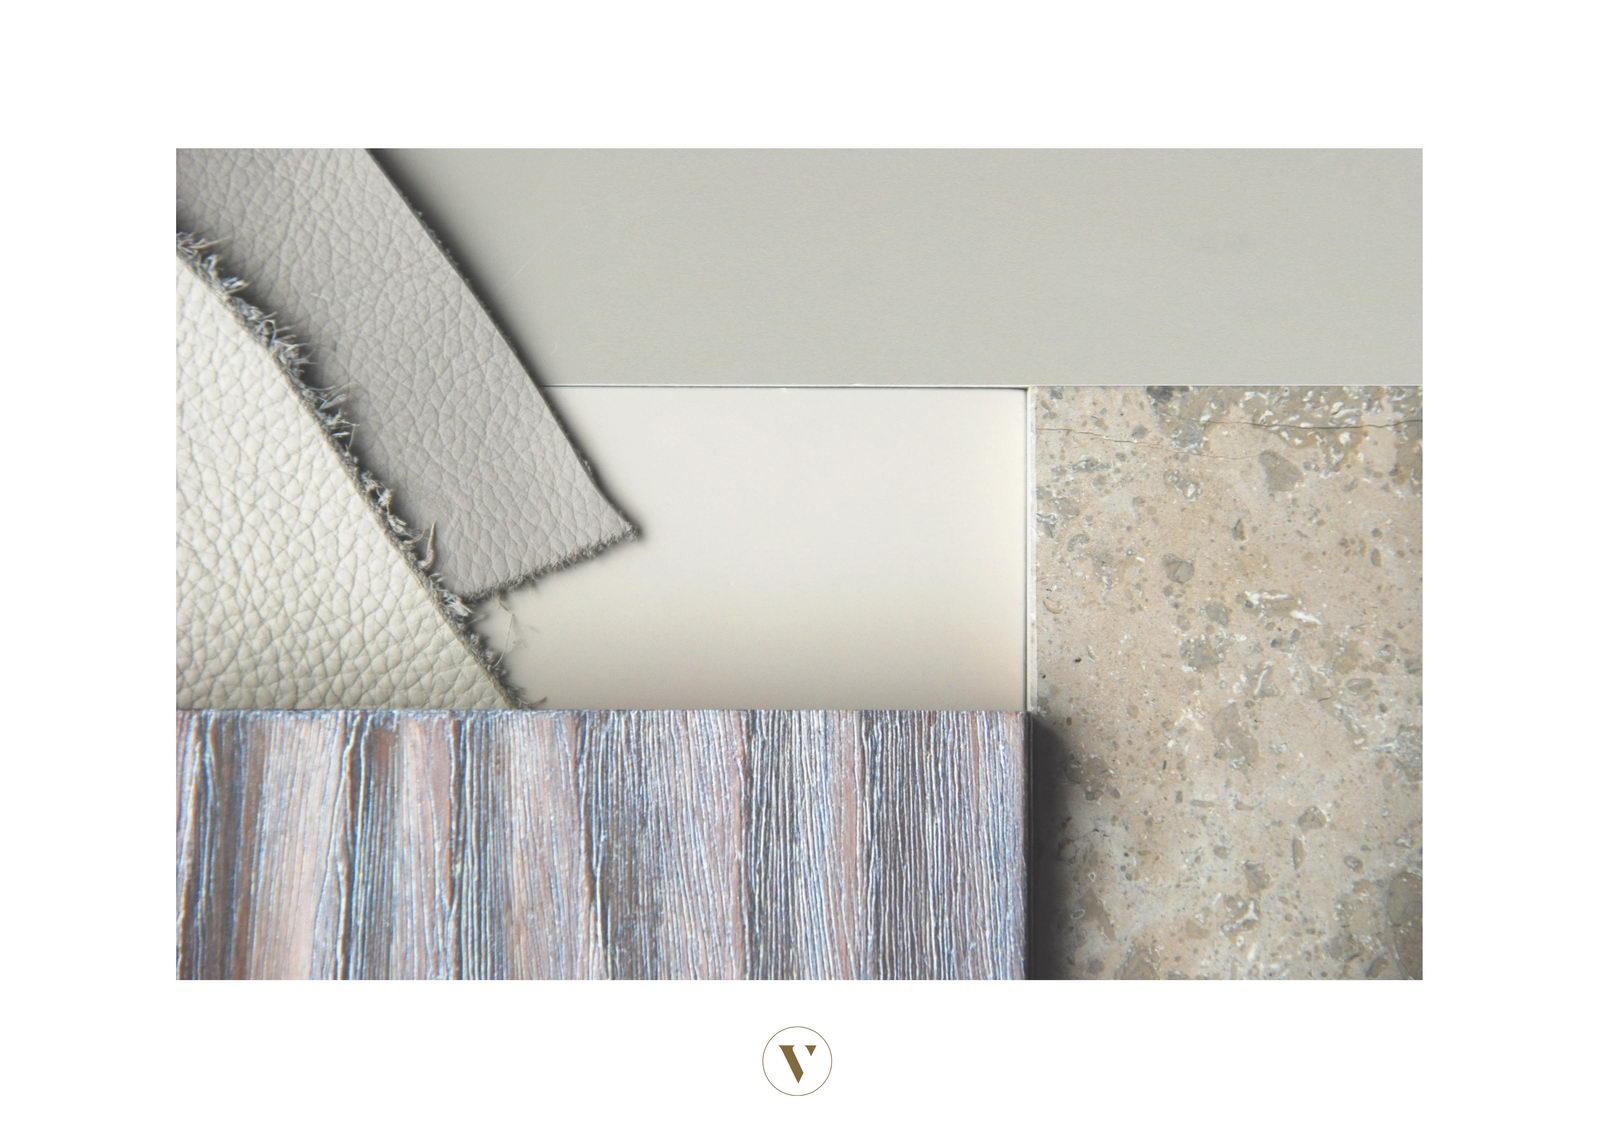 07 - Stateroom materials